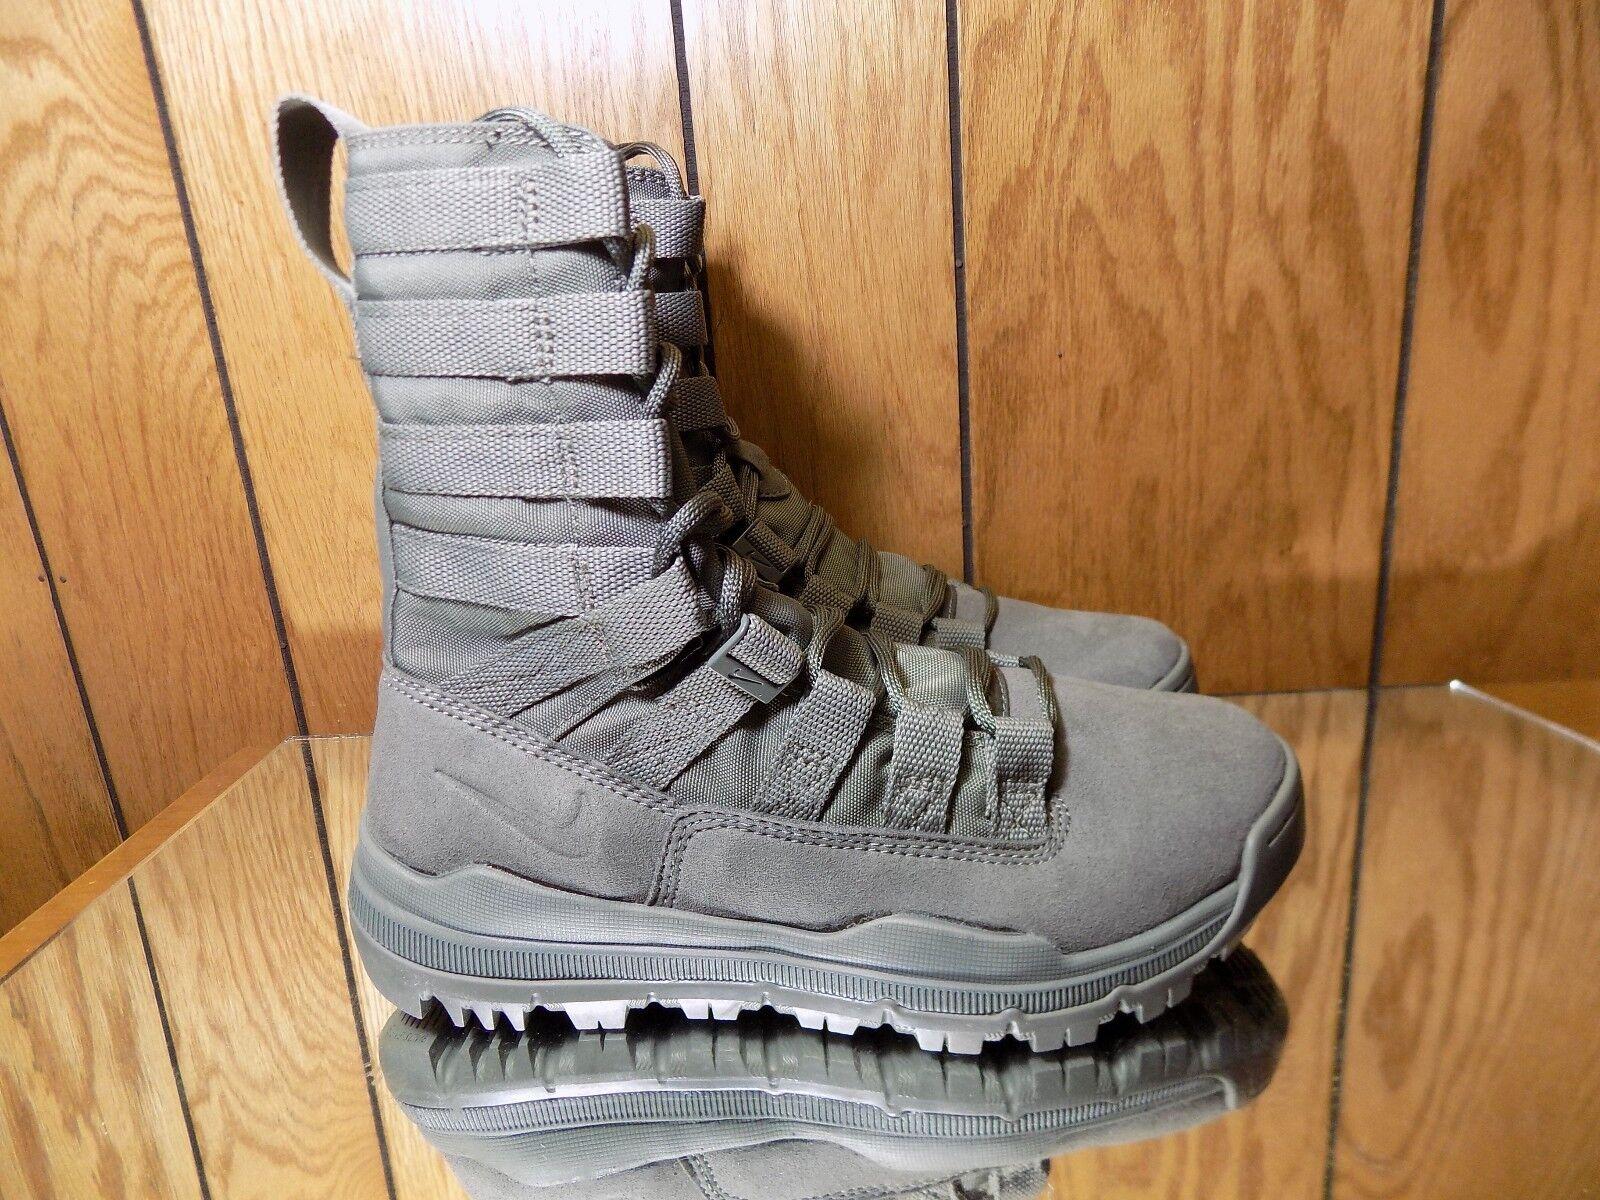 Nike filiale sfb gen 2 8 sage verde oliva 922474-200 sz 10 militari